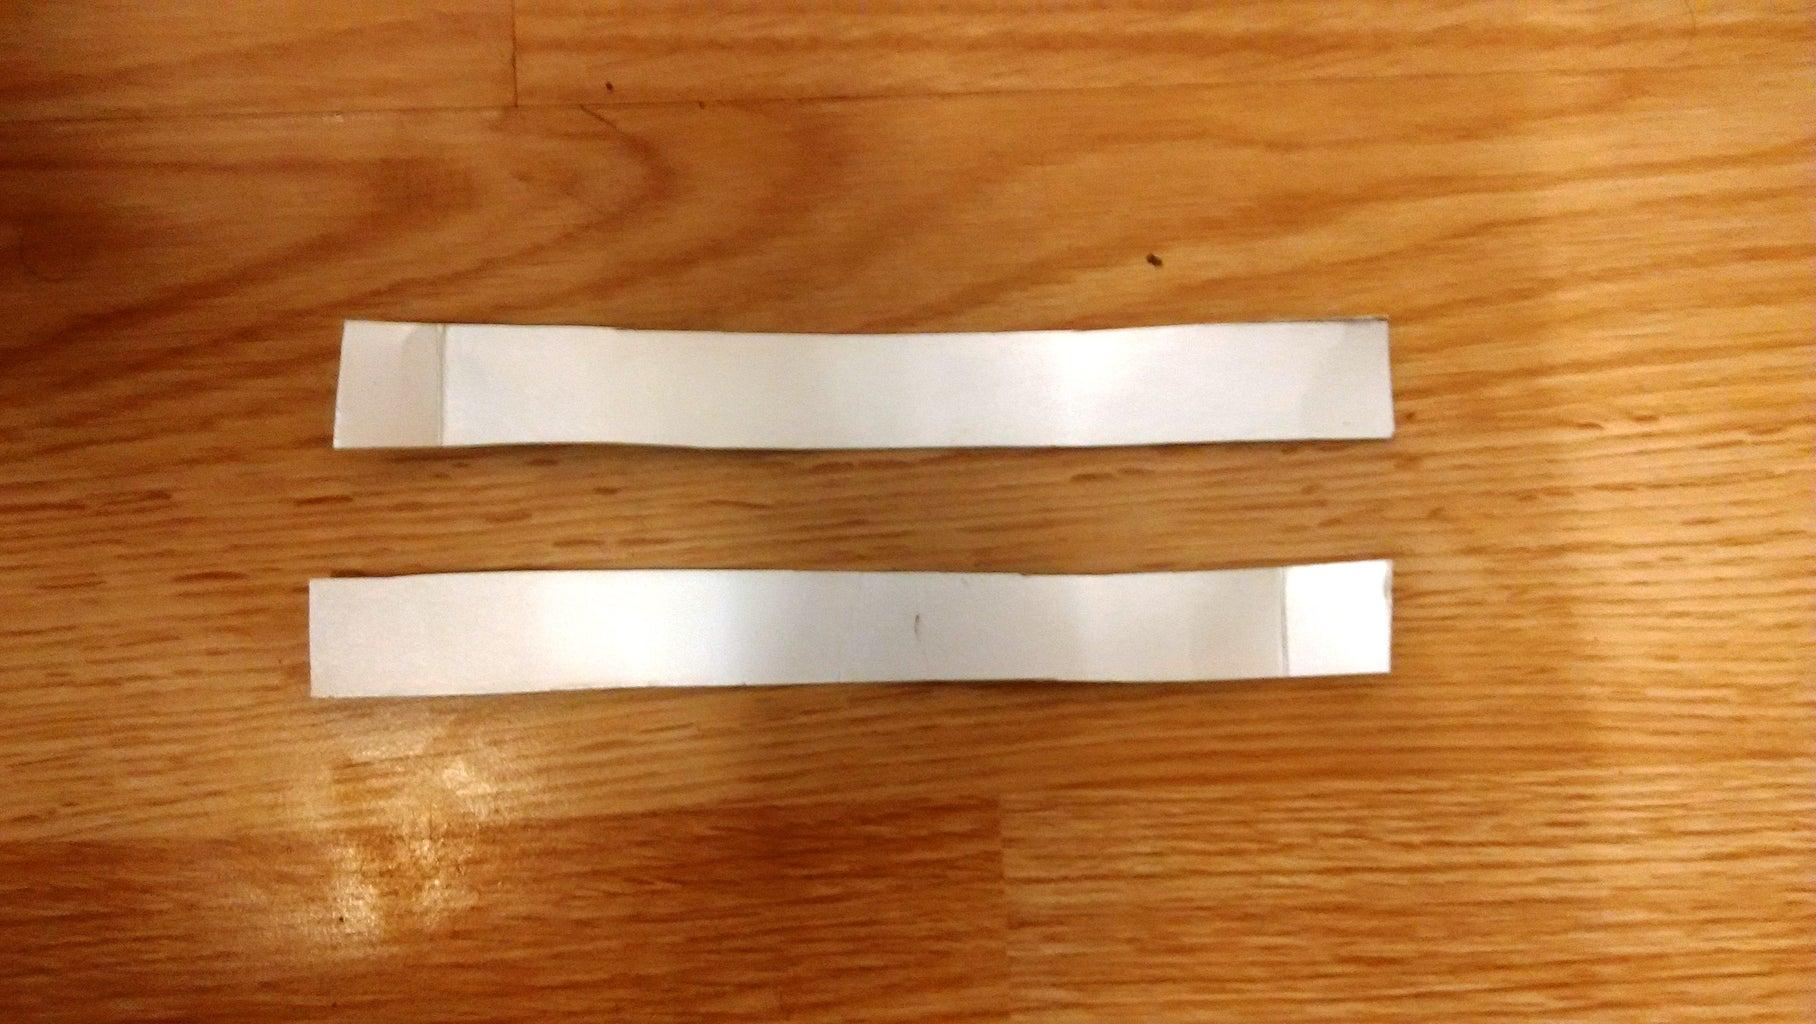 Making the Basic Unit- Strips